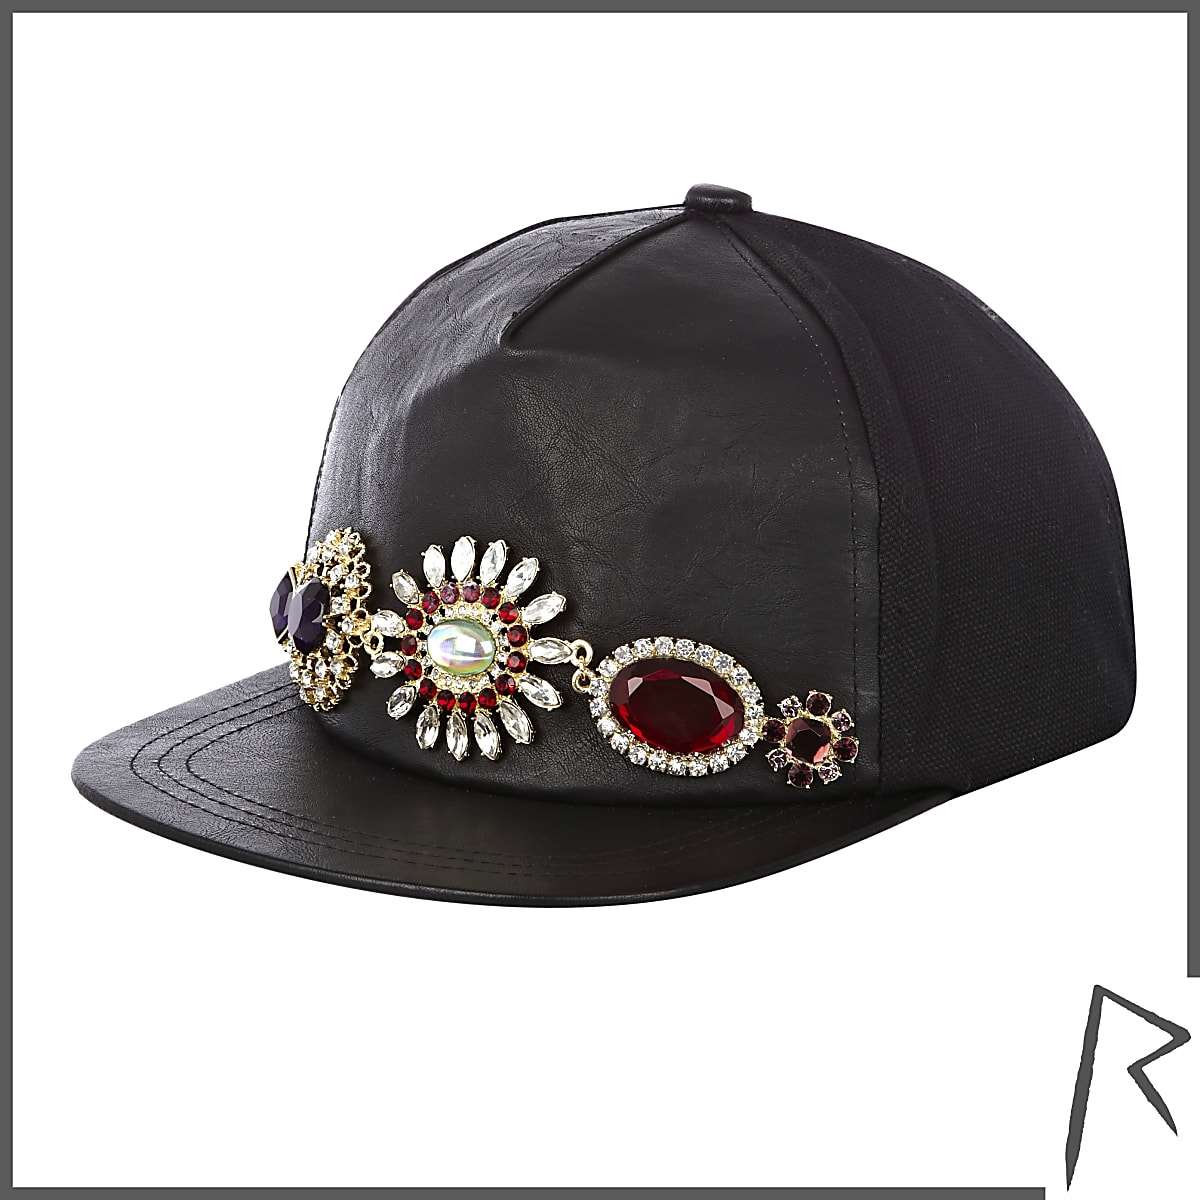 Black leather Rihanna gem stone trucker hat